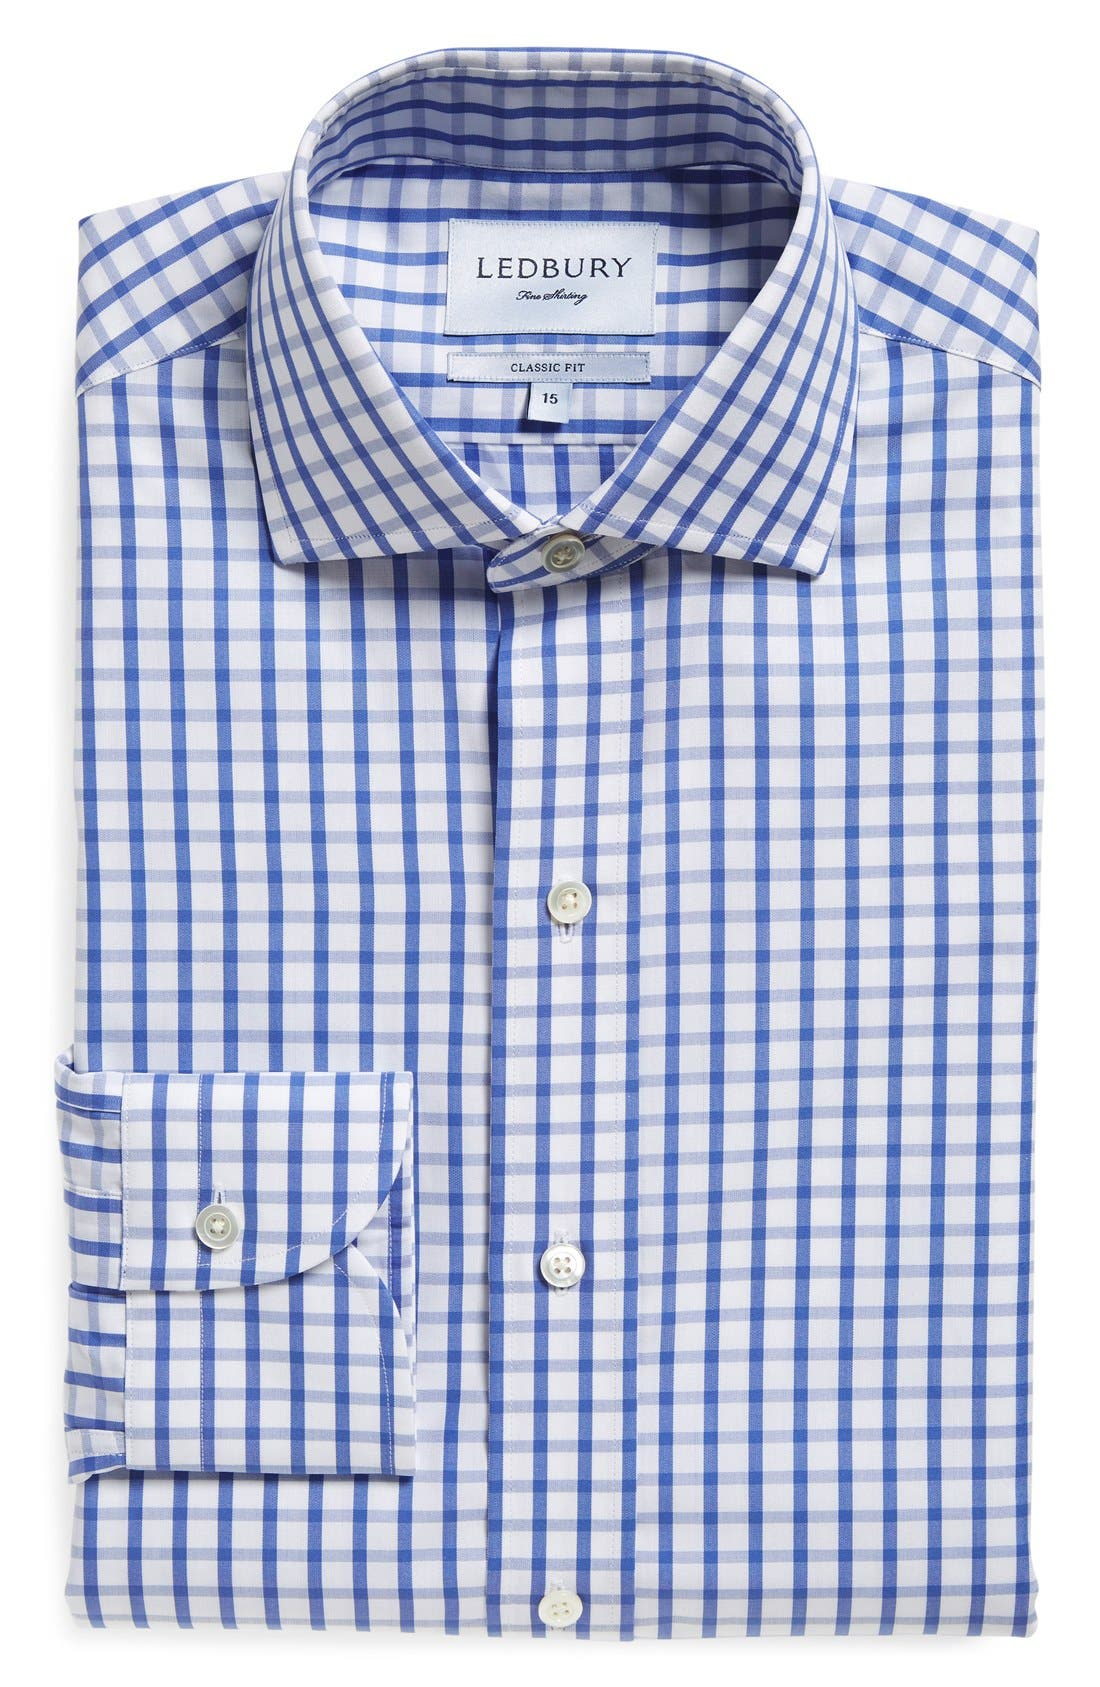 Ledbury 'Urbana Box' Classic Fit Check Dress Shirt